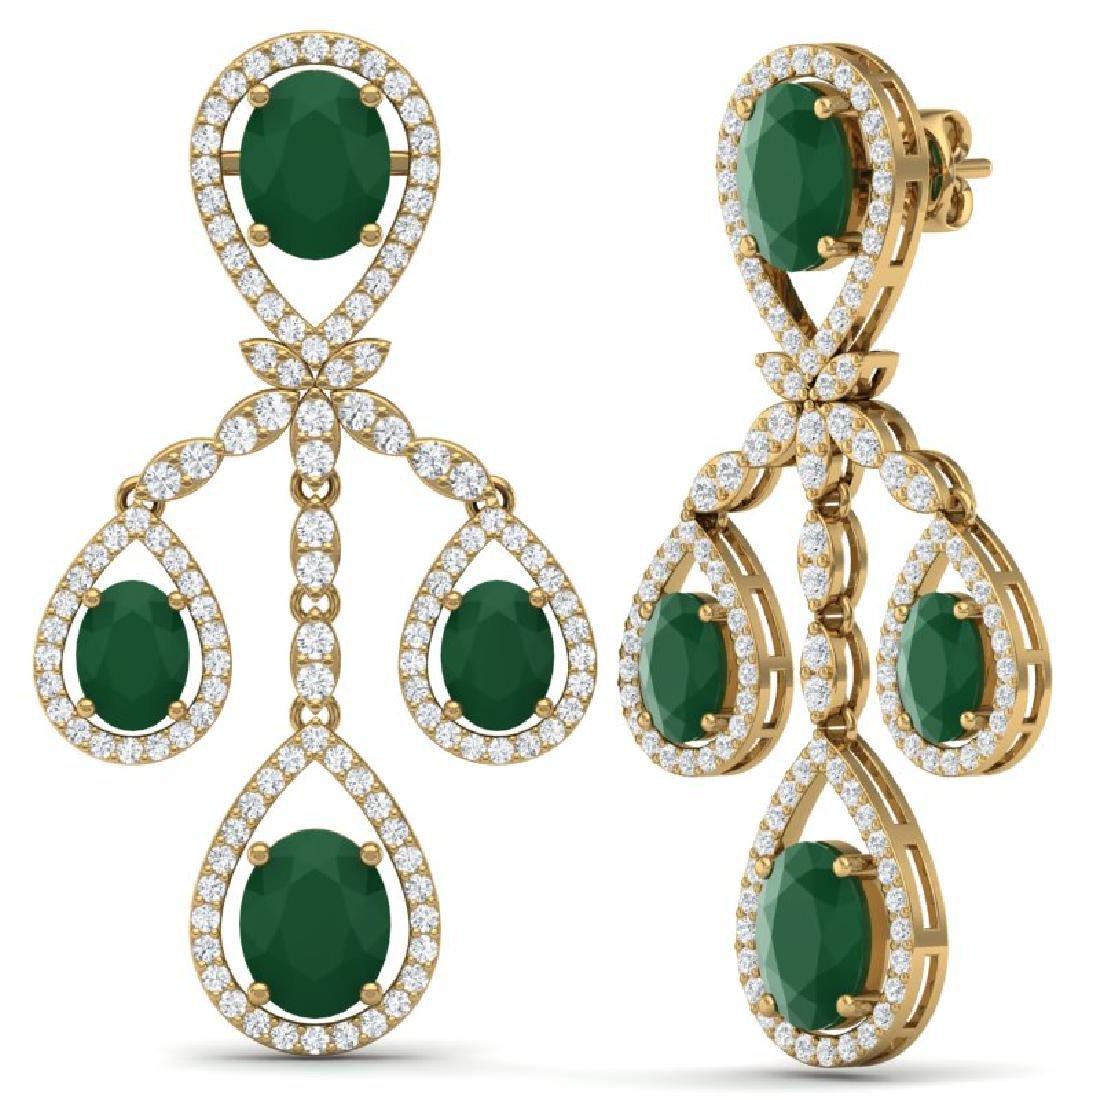 25.08 CTW Royalty Emerald & VS Diamond Earrings 18K - 3